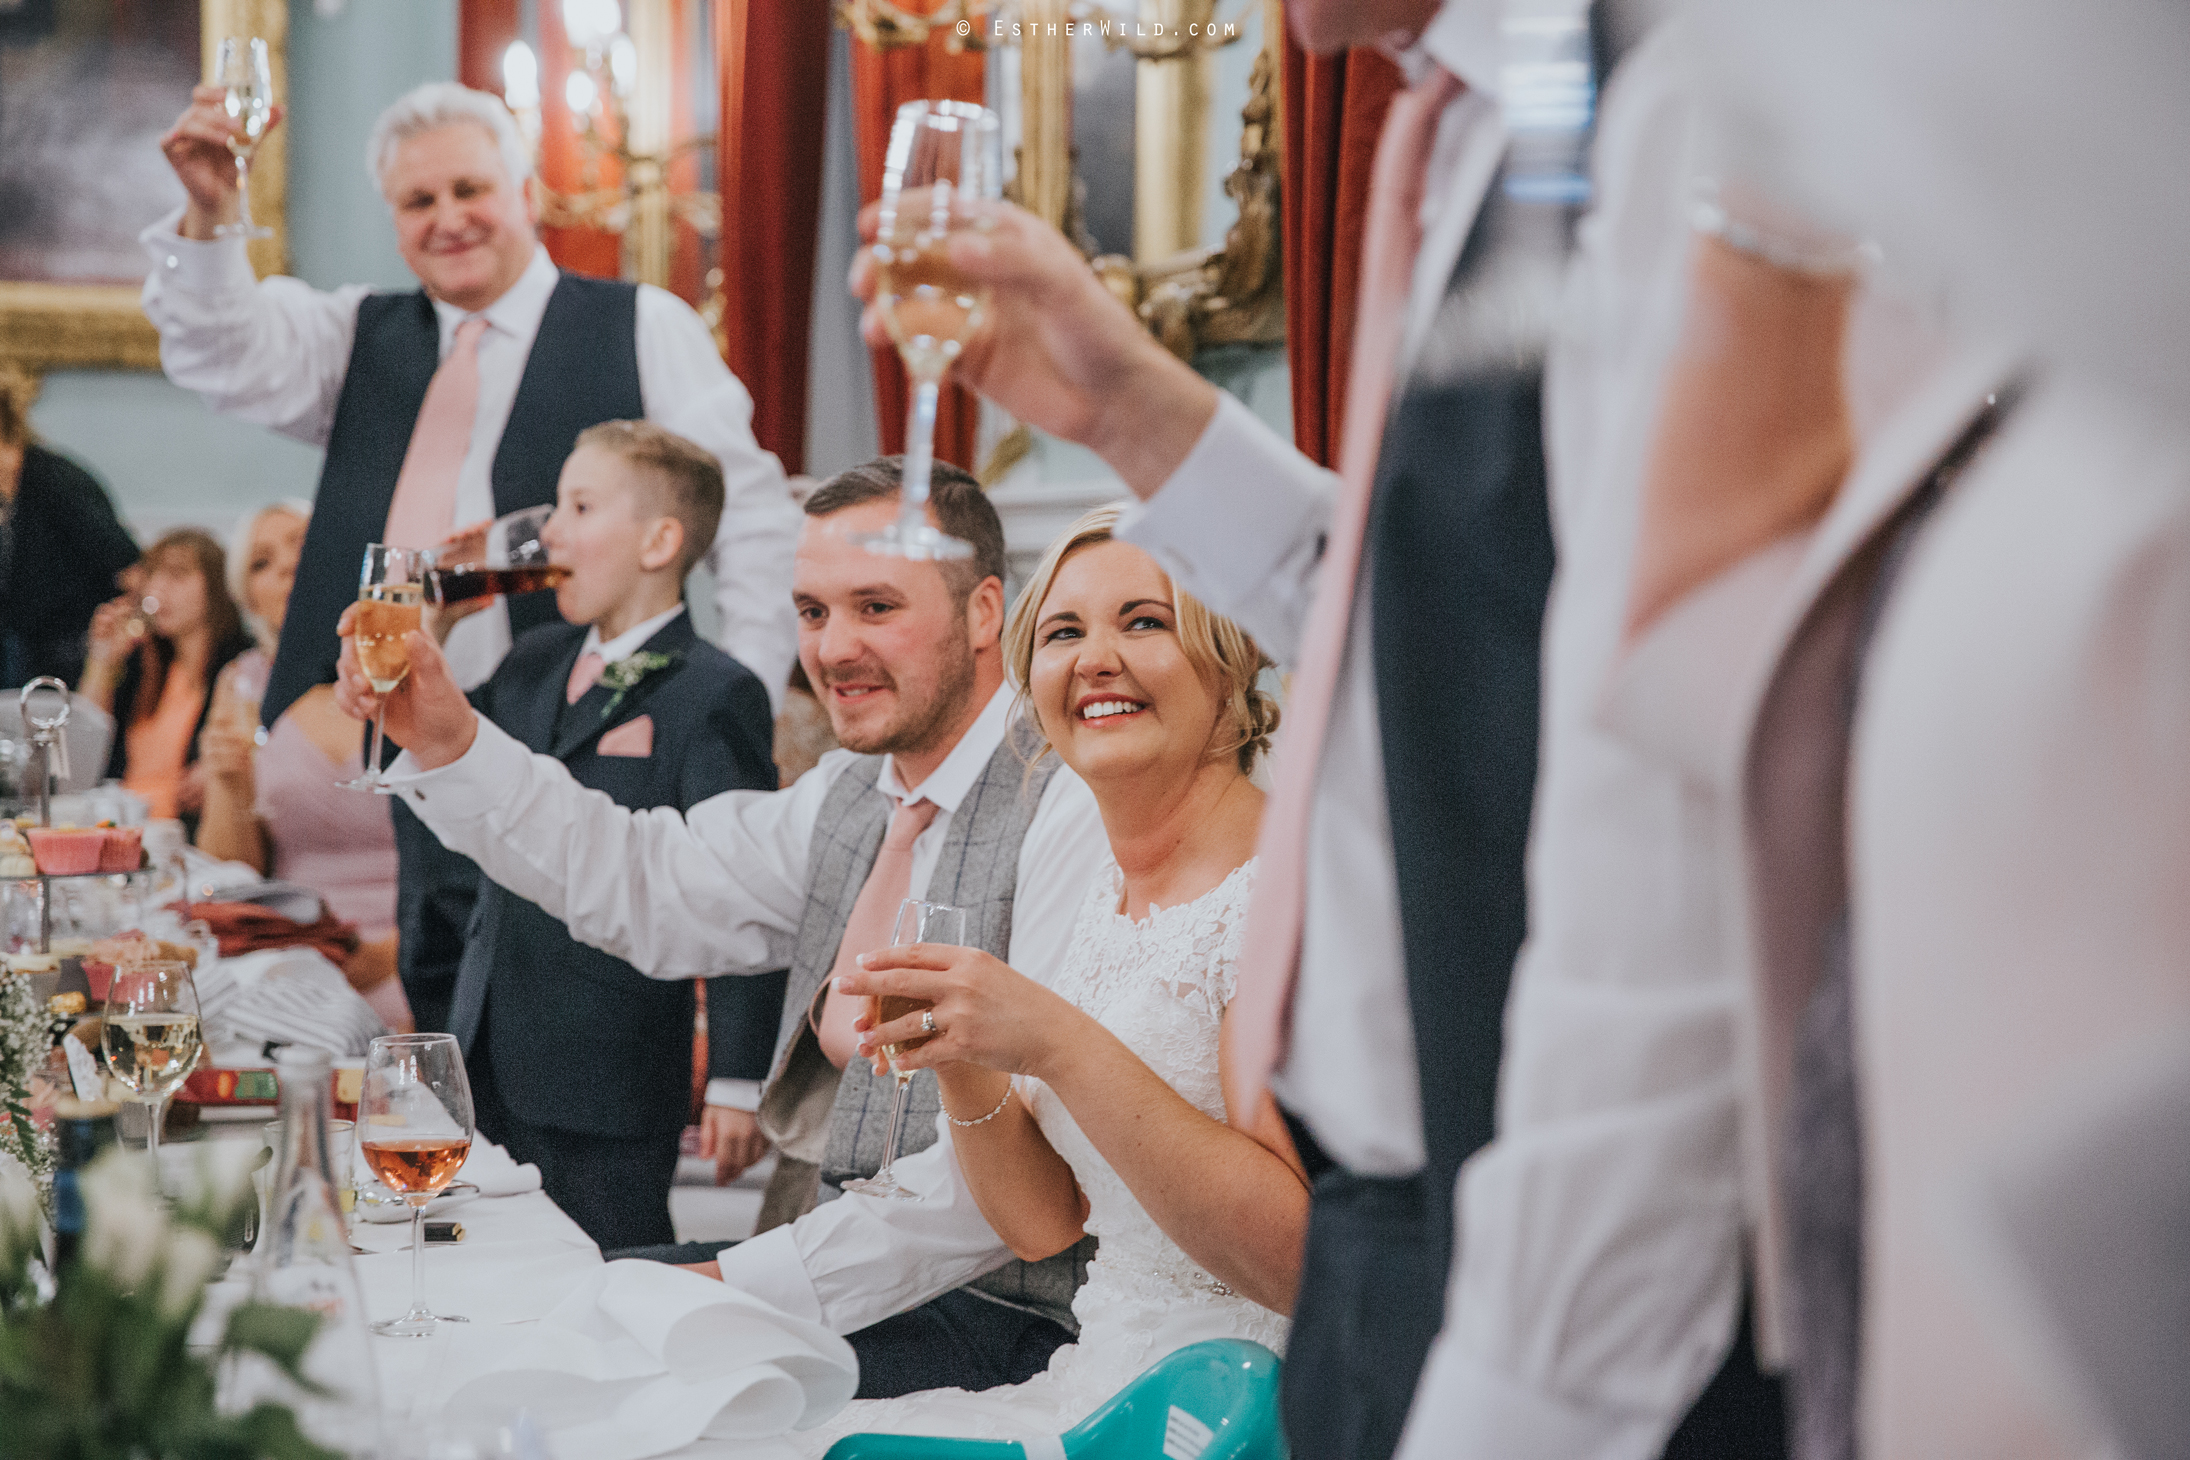 Wedding_Kings_Lynn_Town_Hall_Norfolk_Photographer_Esther_Wild_IMG_1687_IMGL0561.jpg